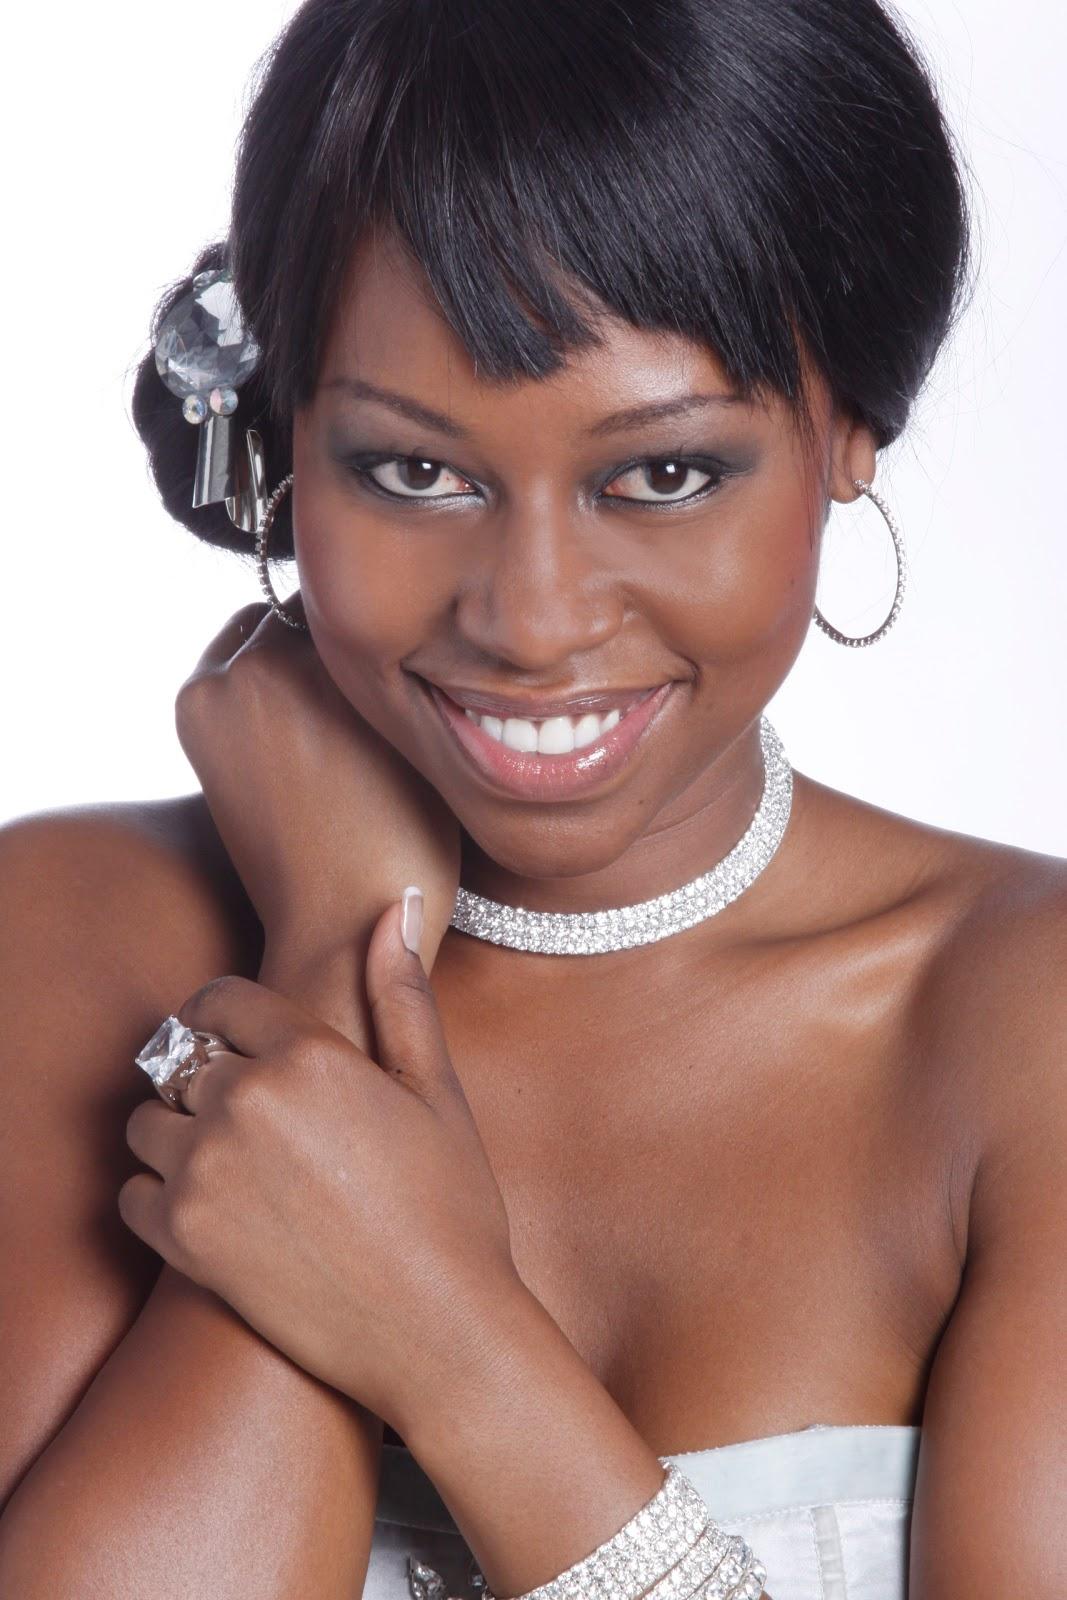 Elana+Afrika+affair+Ian+Bredenkamp+KFM+M-Net Reasons Behind Wedding Traditions